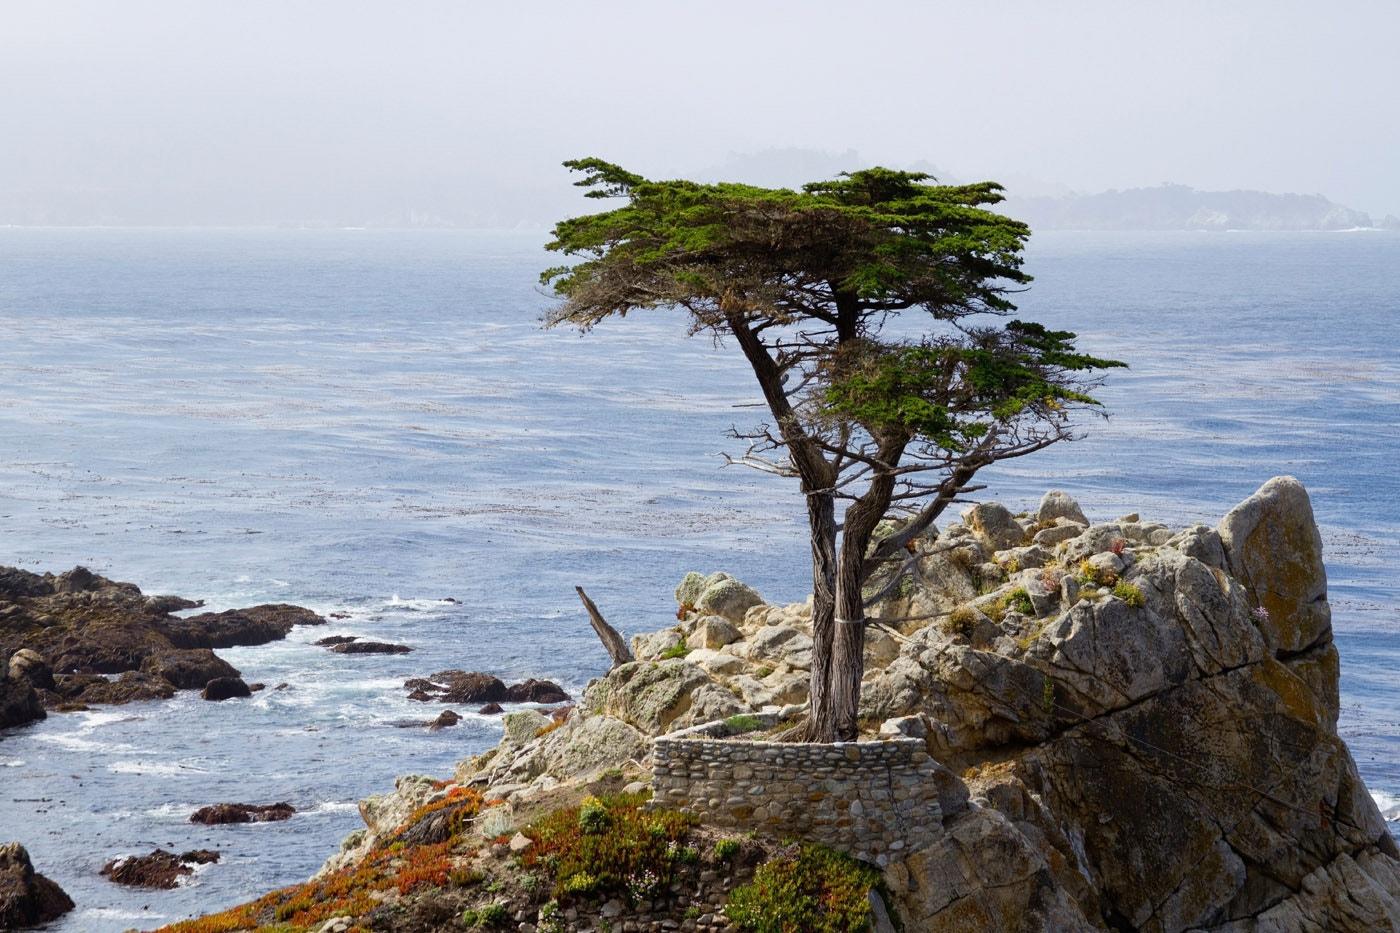 Lone Pine, Carmel, California